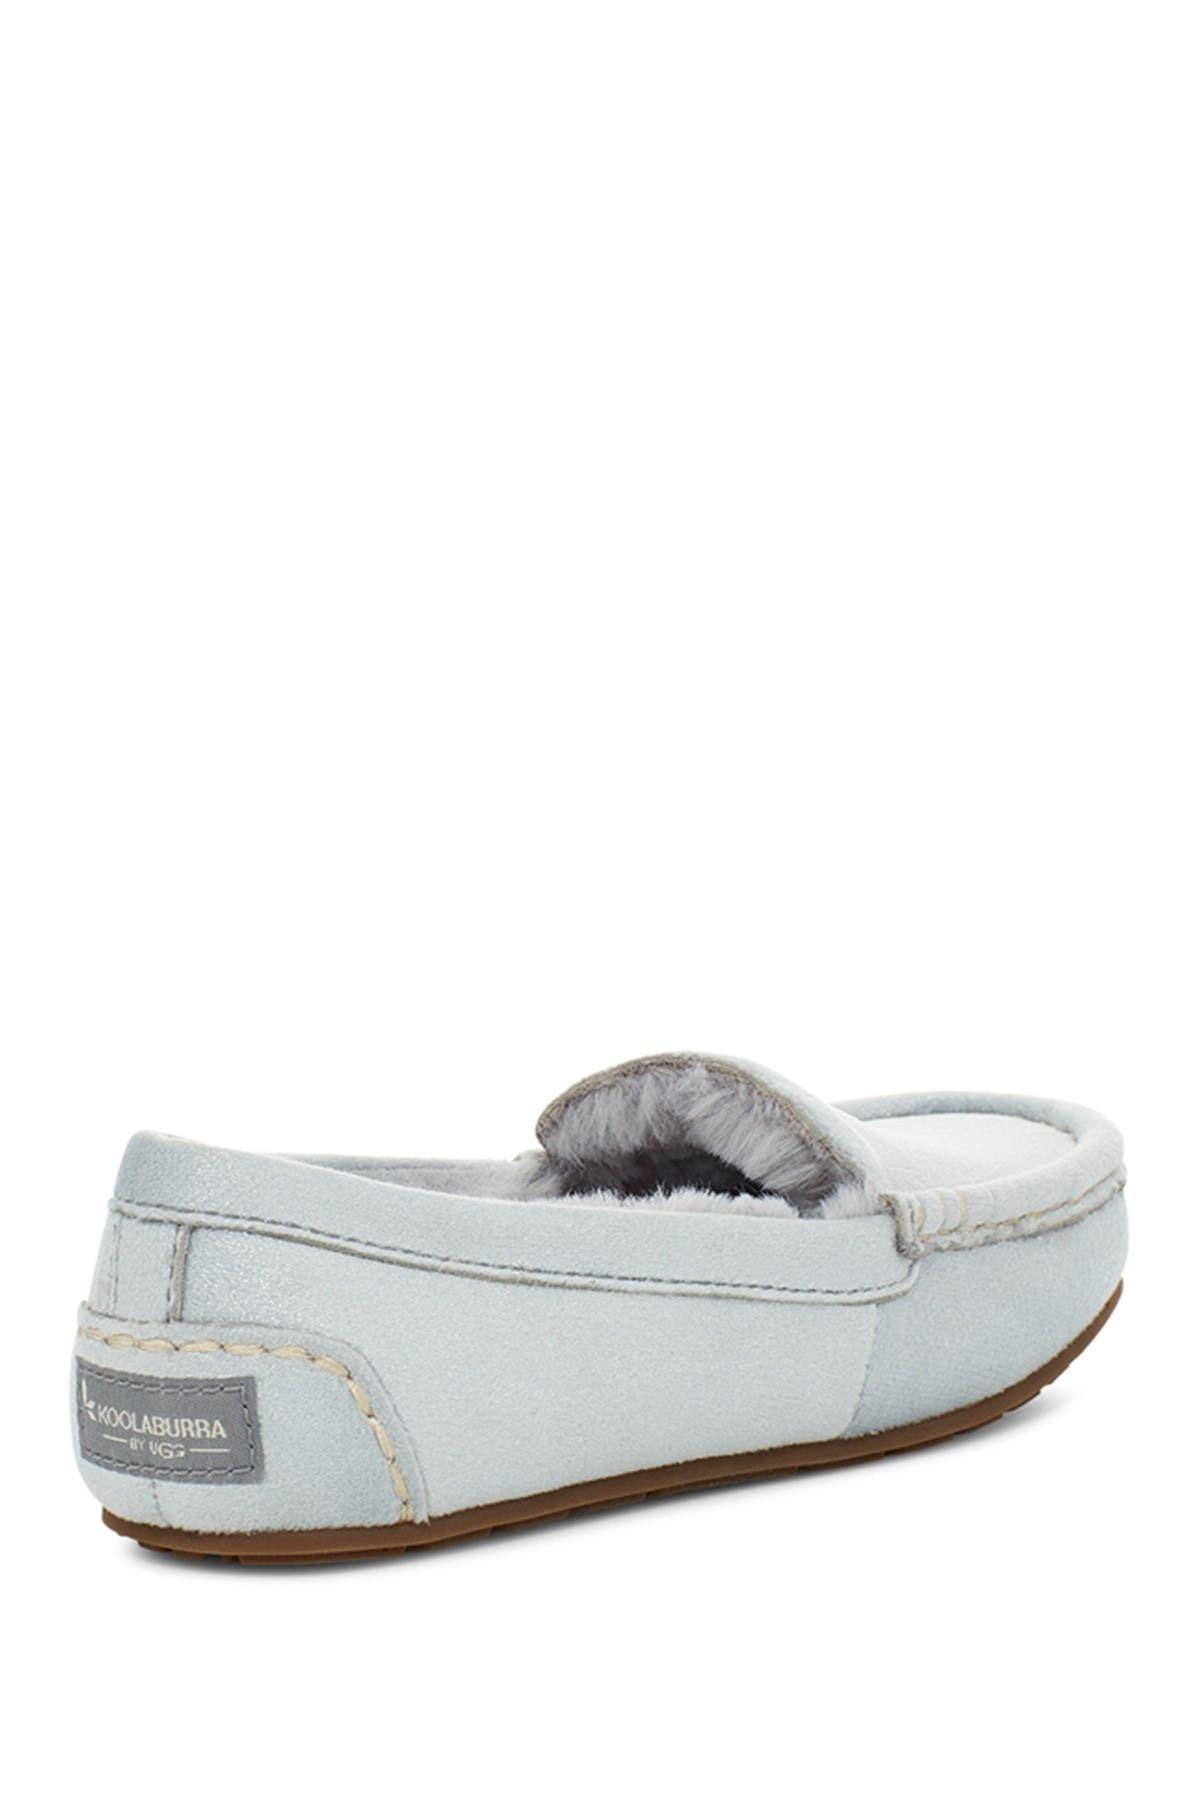 KOOLABURRA BY UGG Riley Shimmer Faux Fur Lined Moccasin